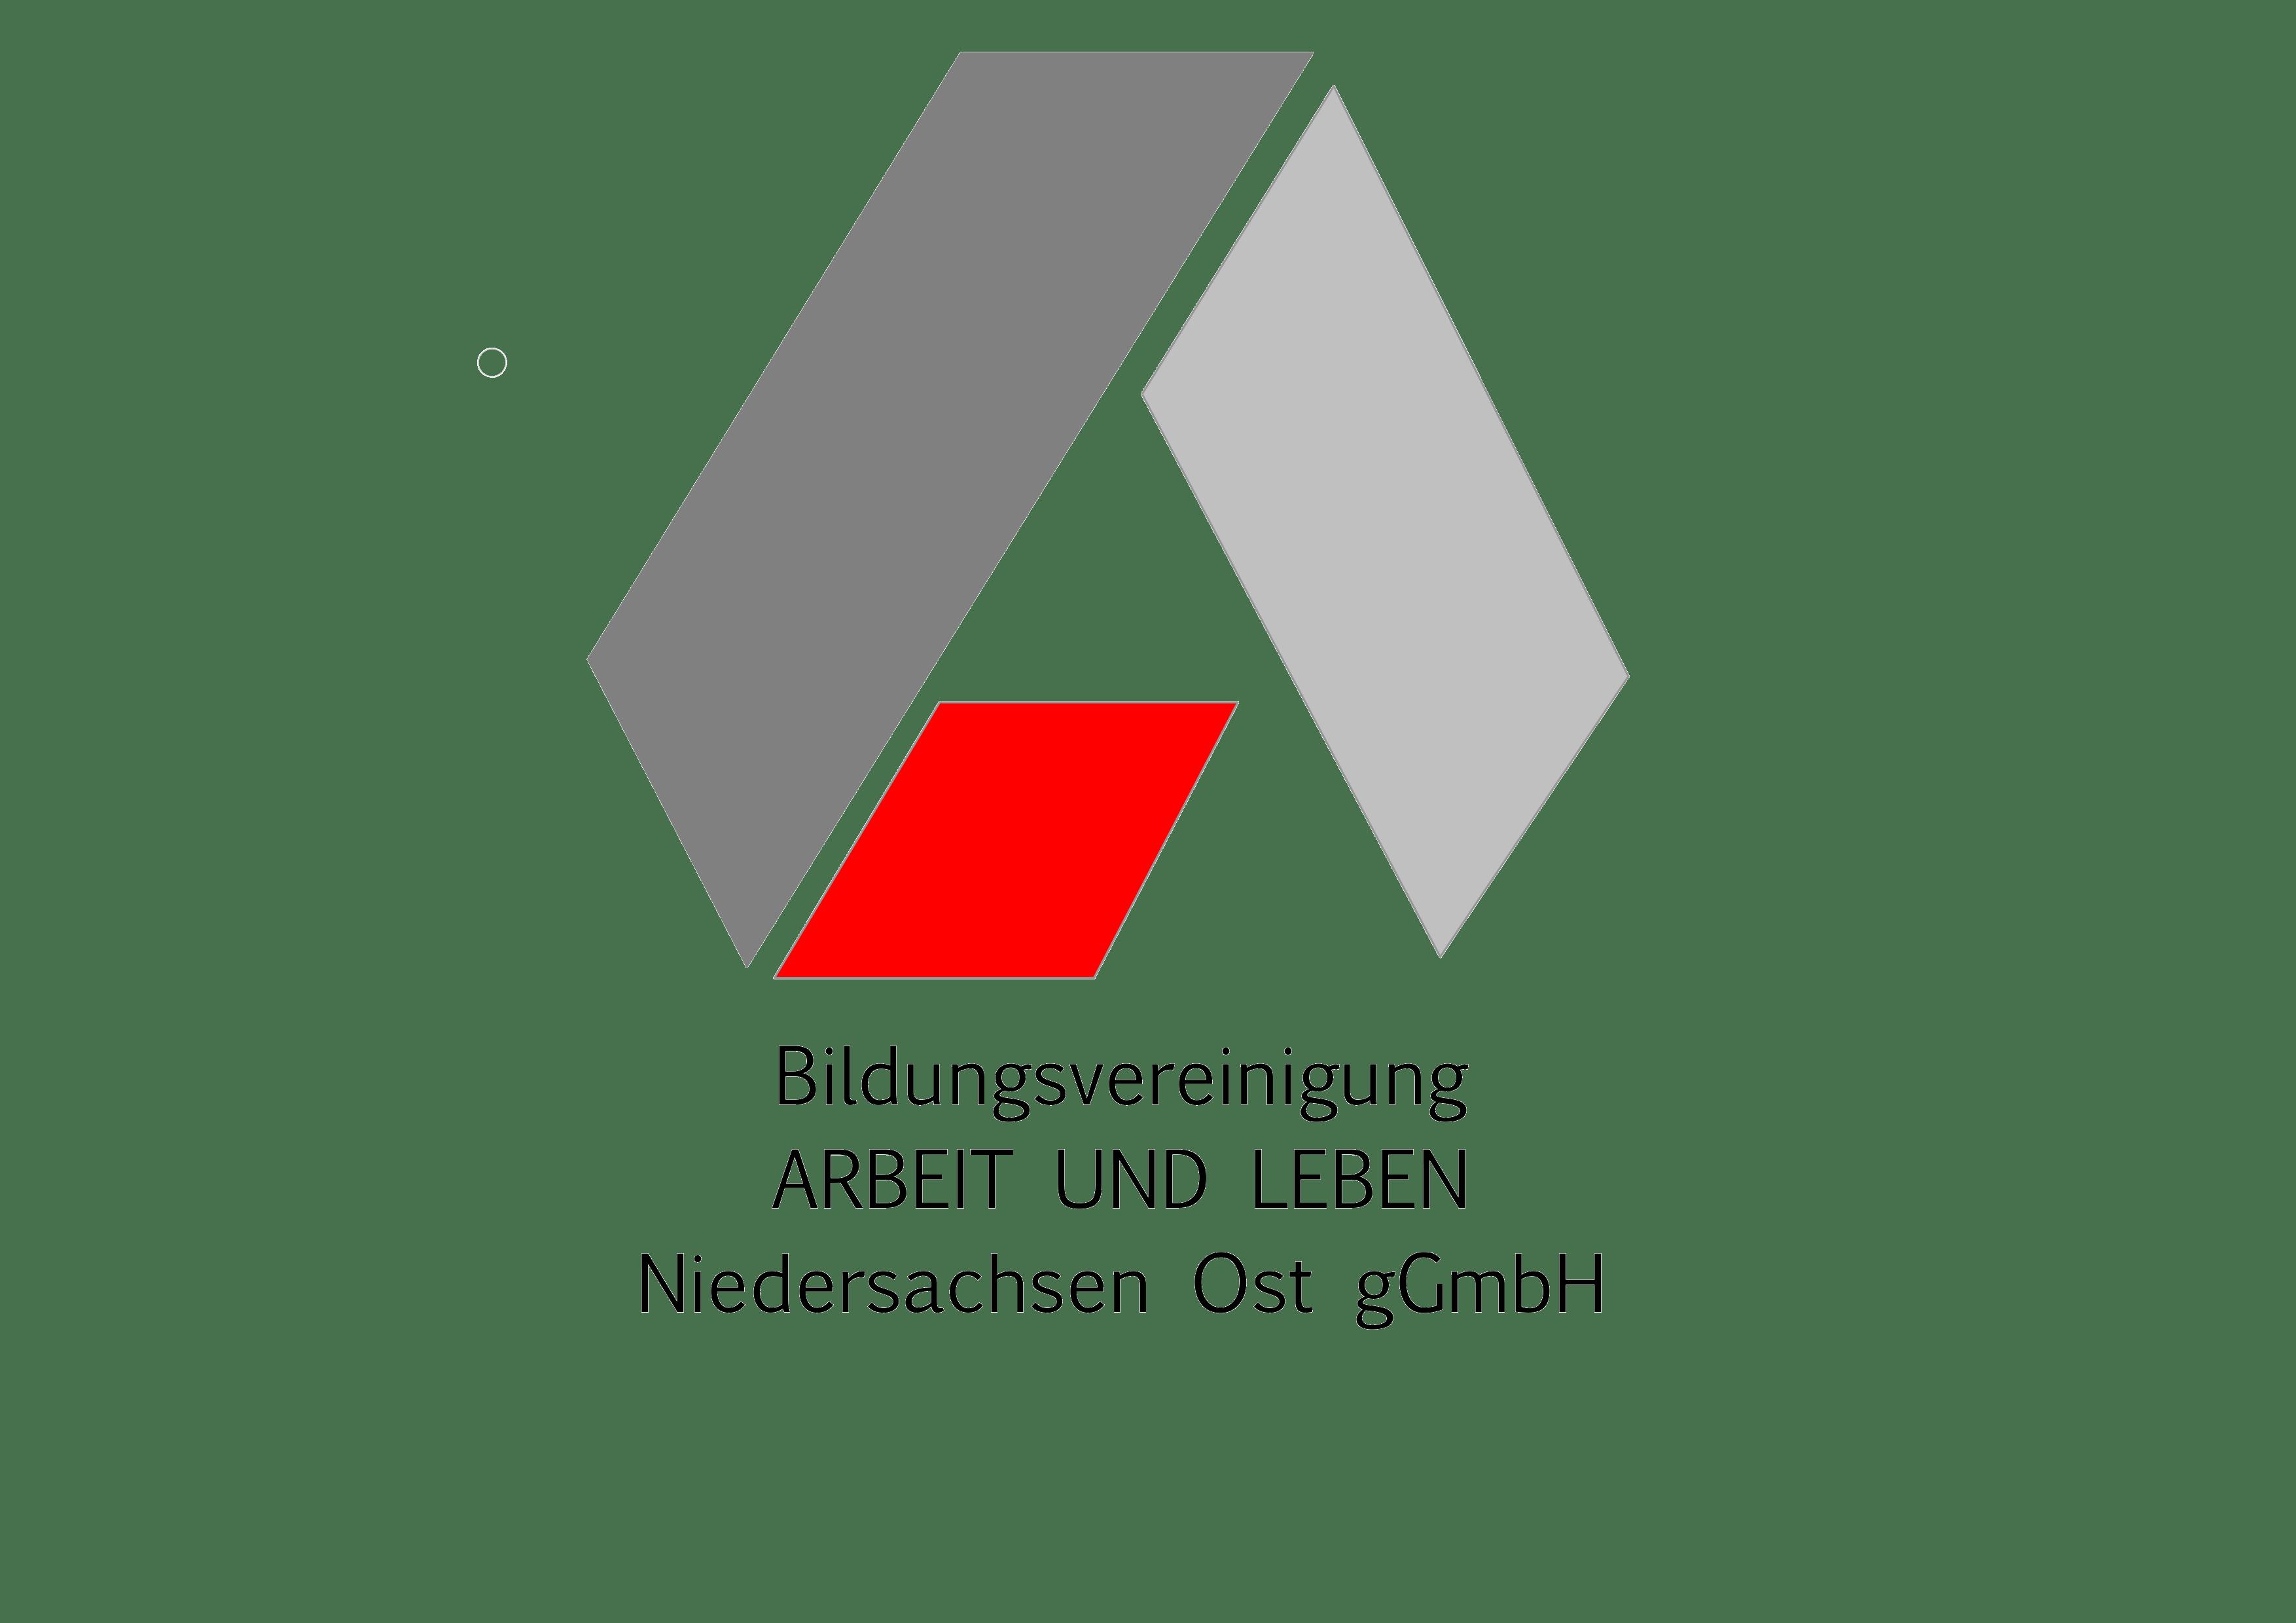 Logo Ost gGmbH